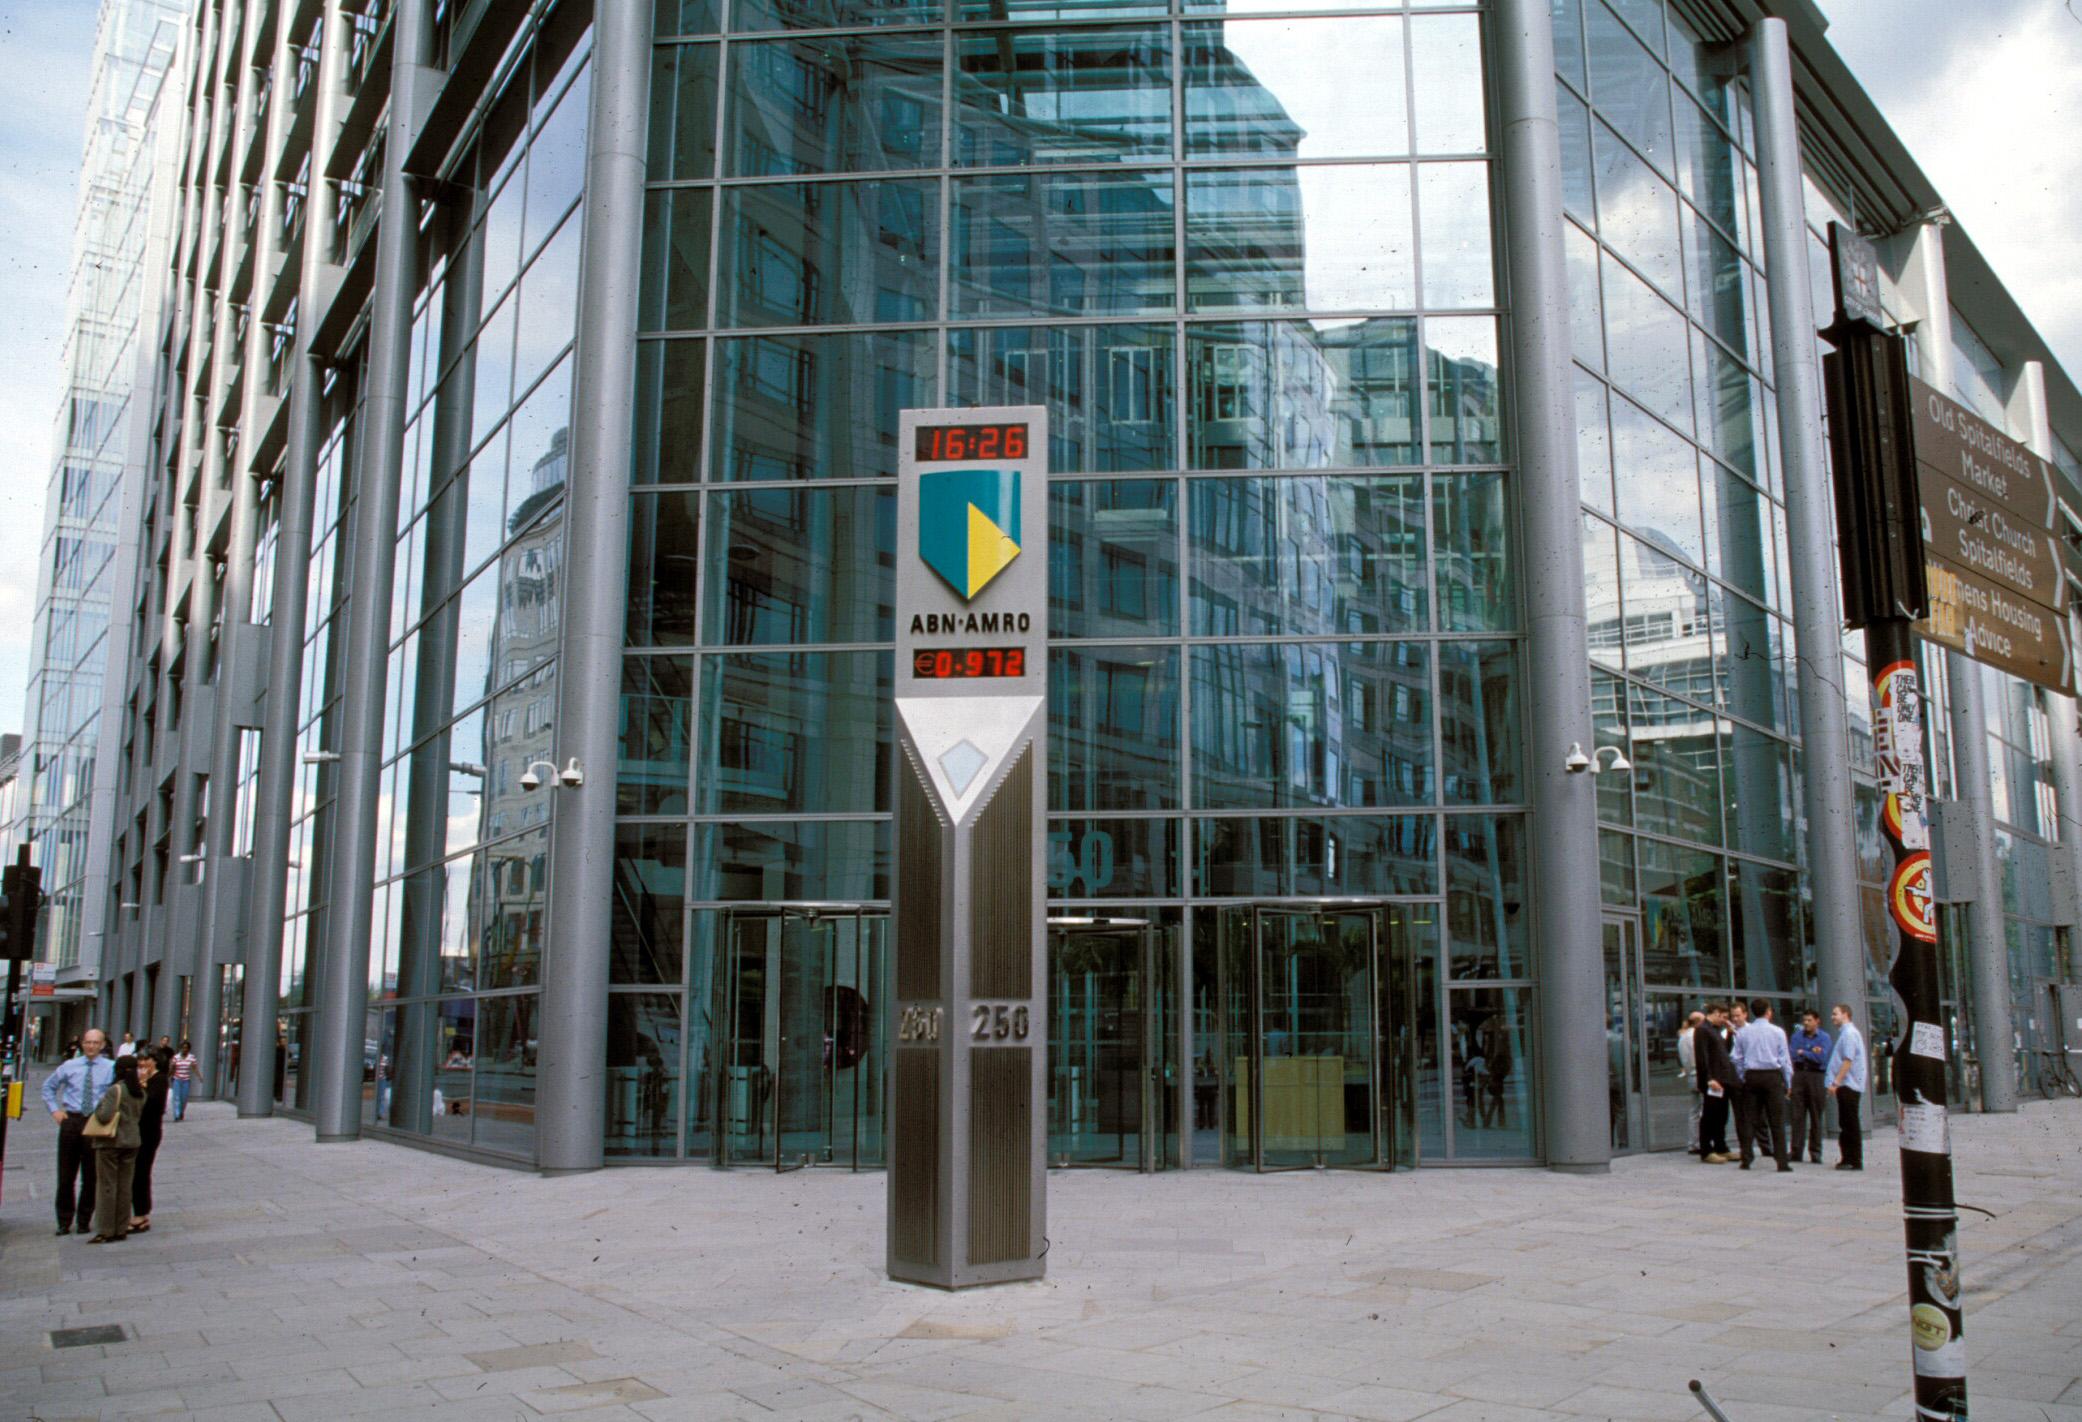 ABN AMRO Headquarters